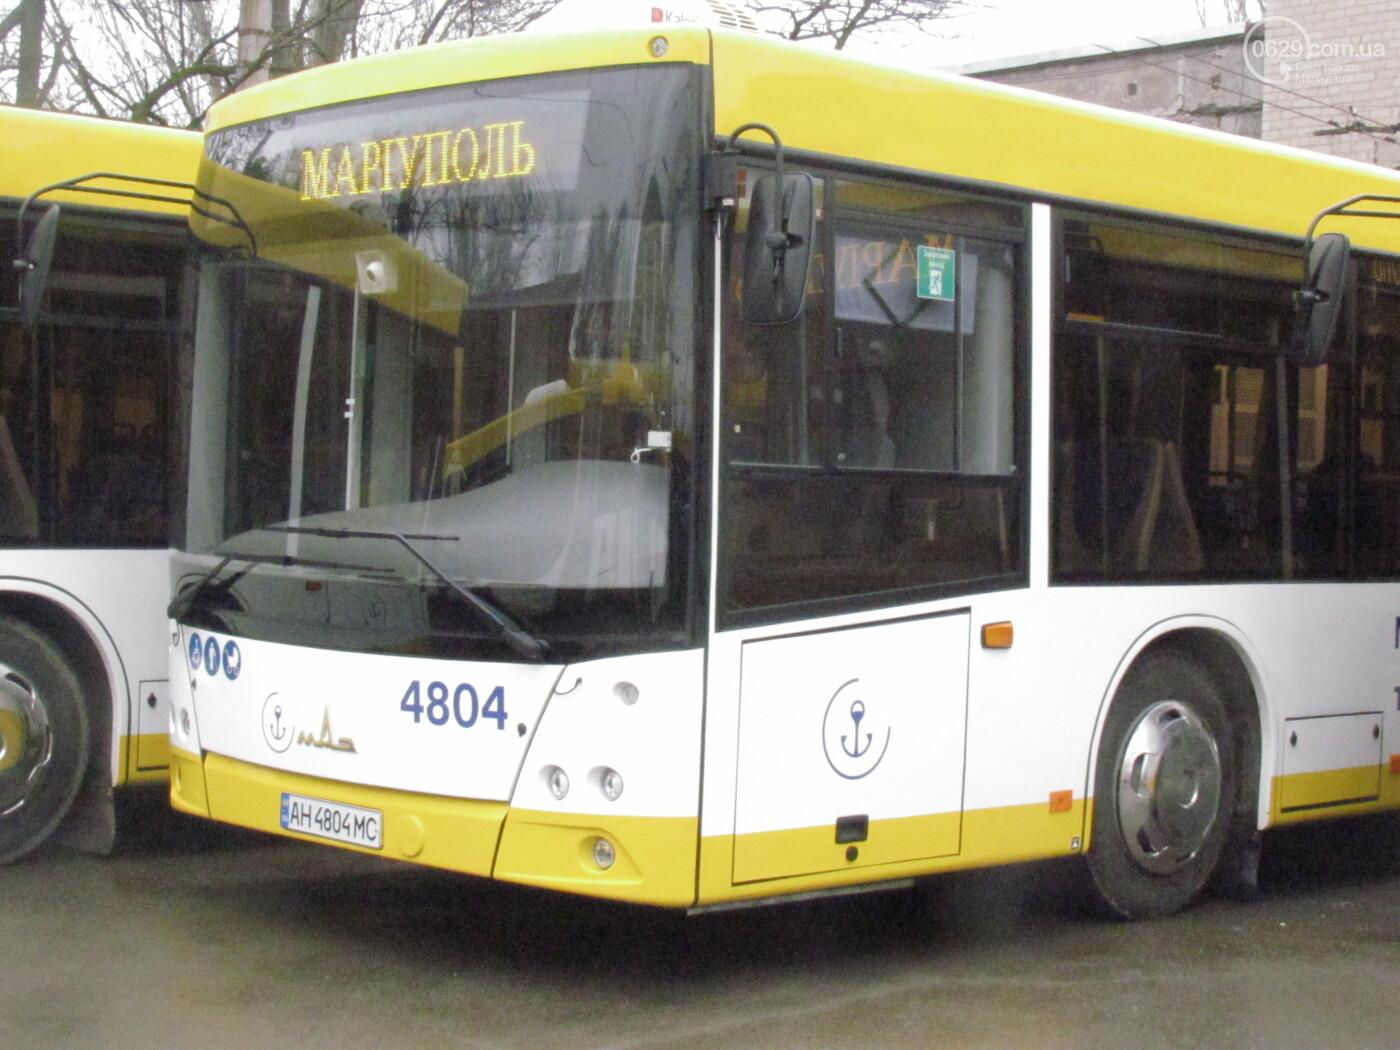 """На работу - на ""мерседесах!"" Как в Мариуполе обновляют транспорт, маршруты и депо, - ФОТОРЕПОРТАЖ, фото-2"